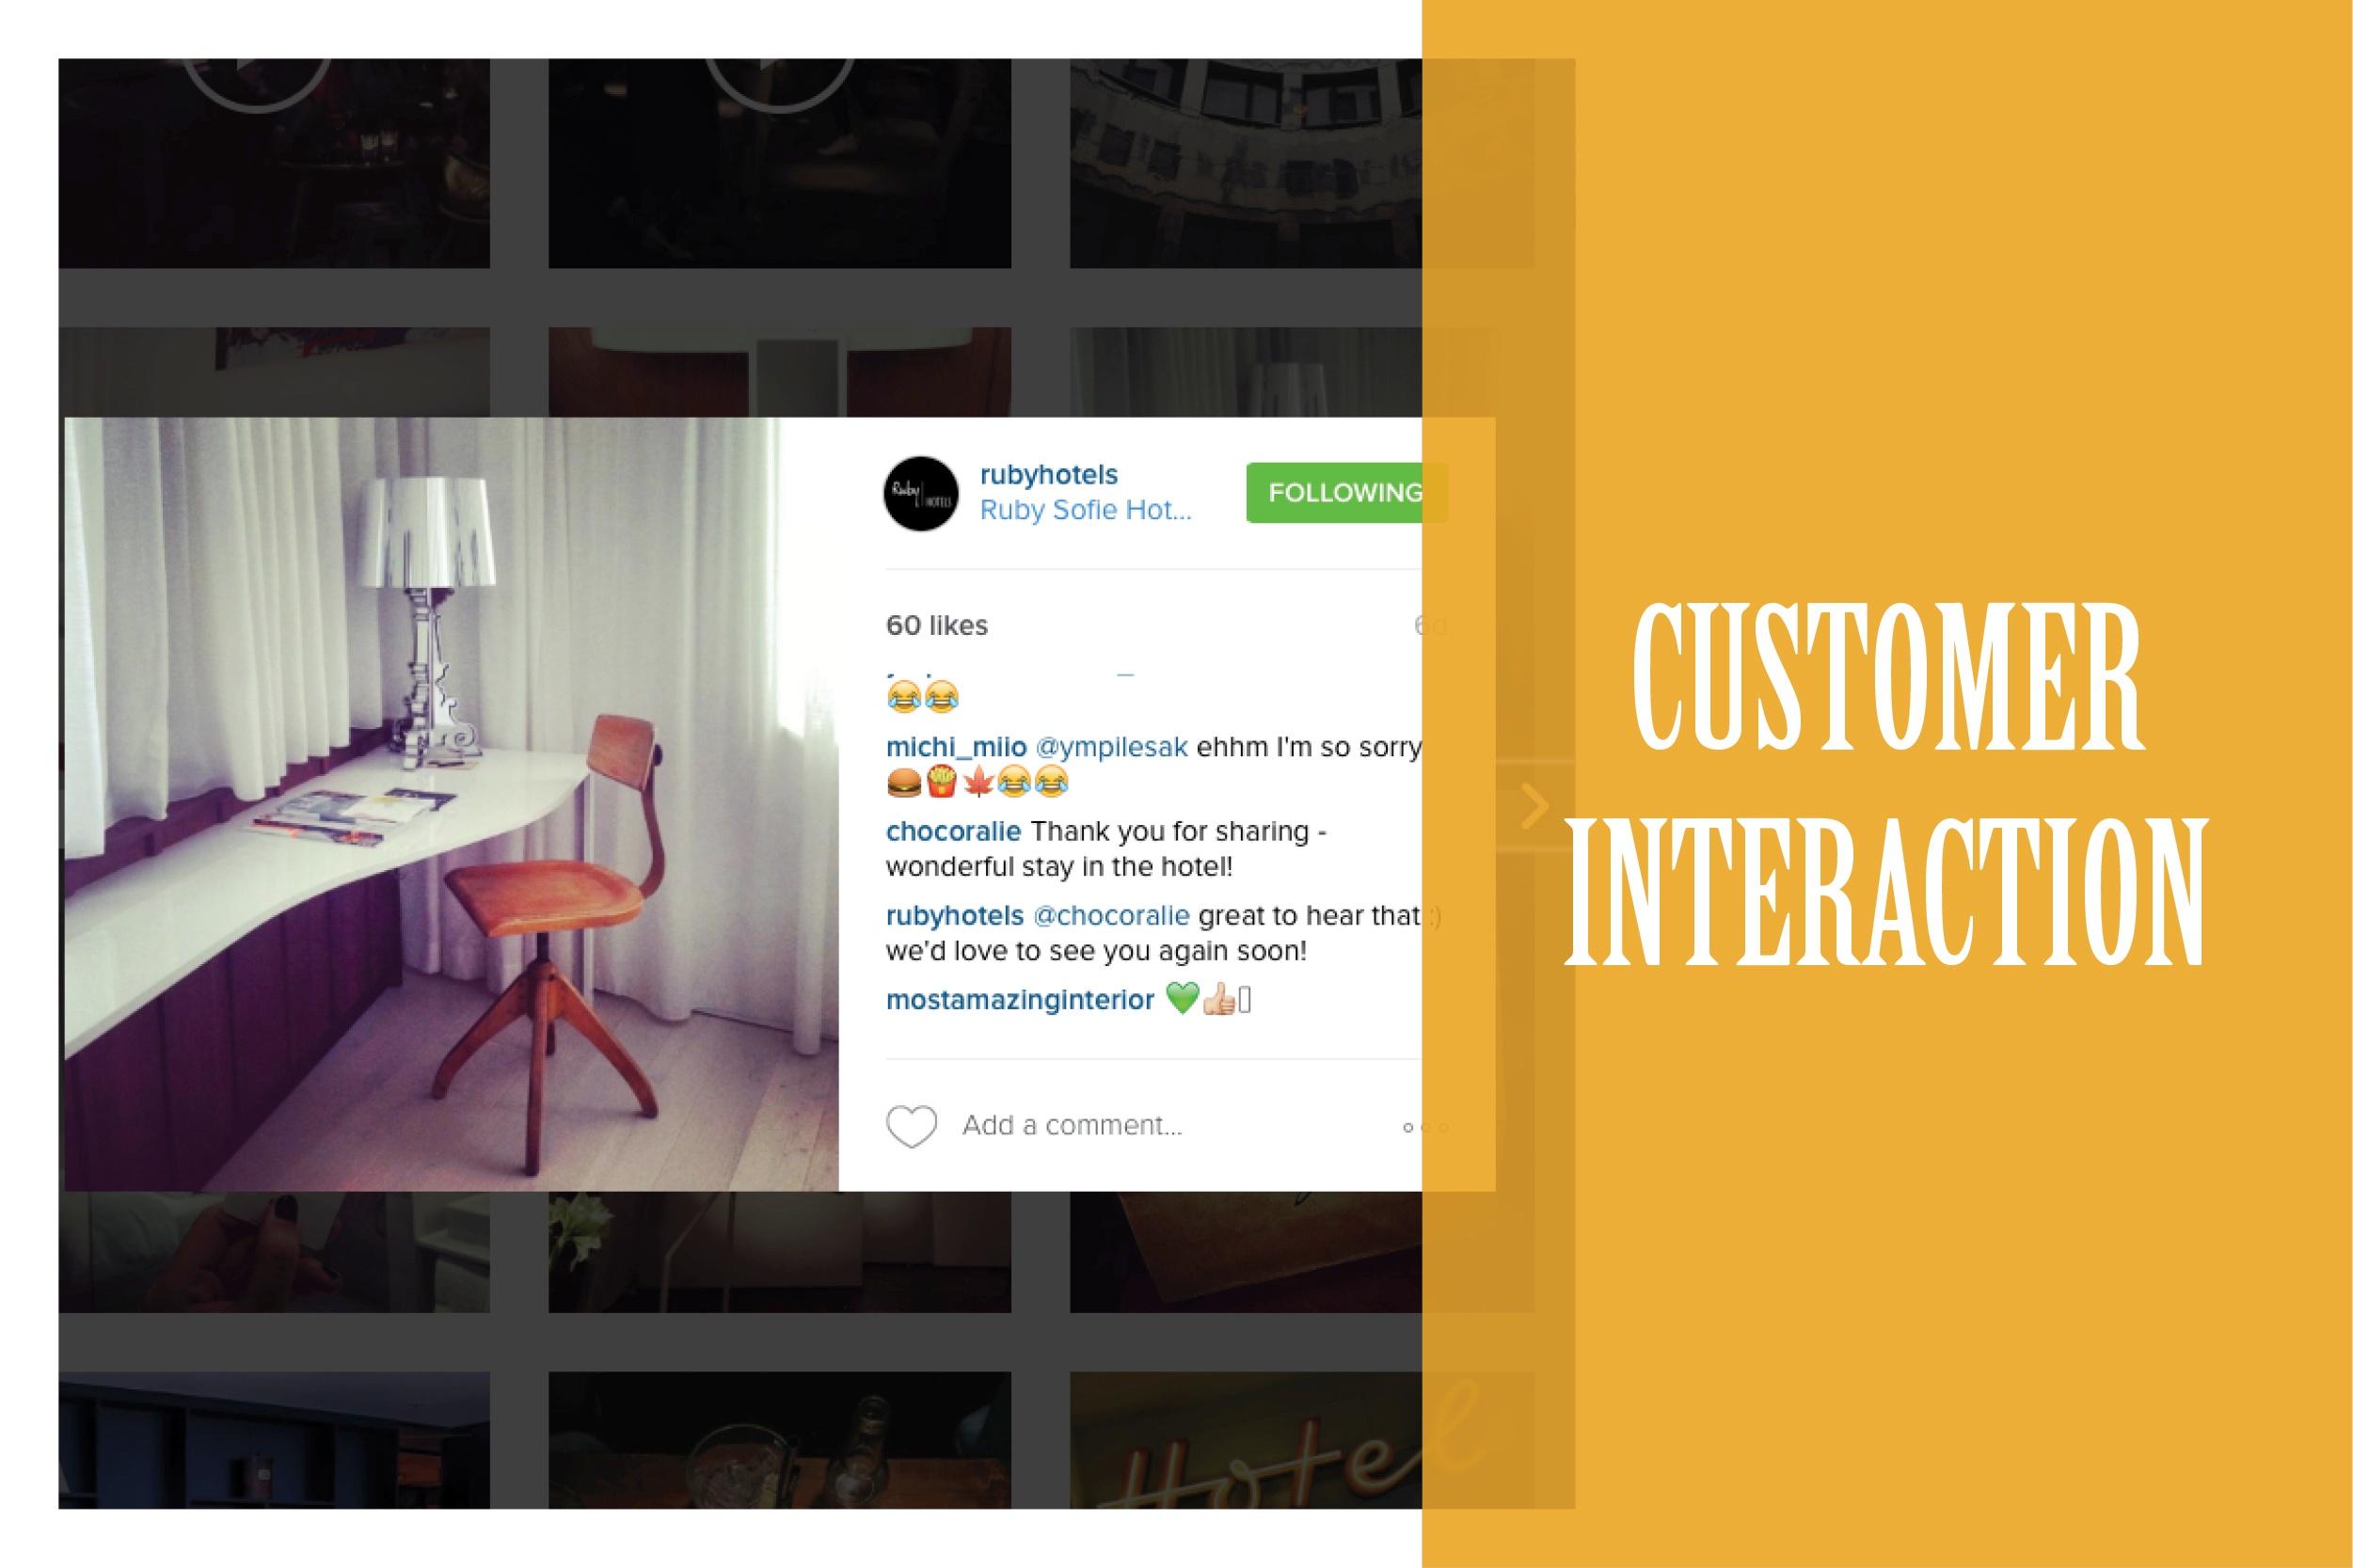 customer_interaction.jpg